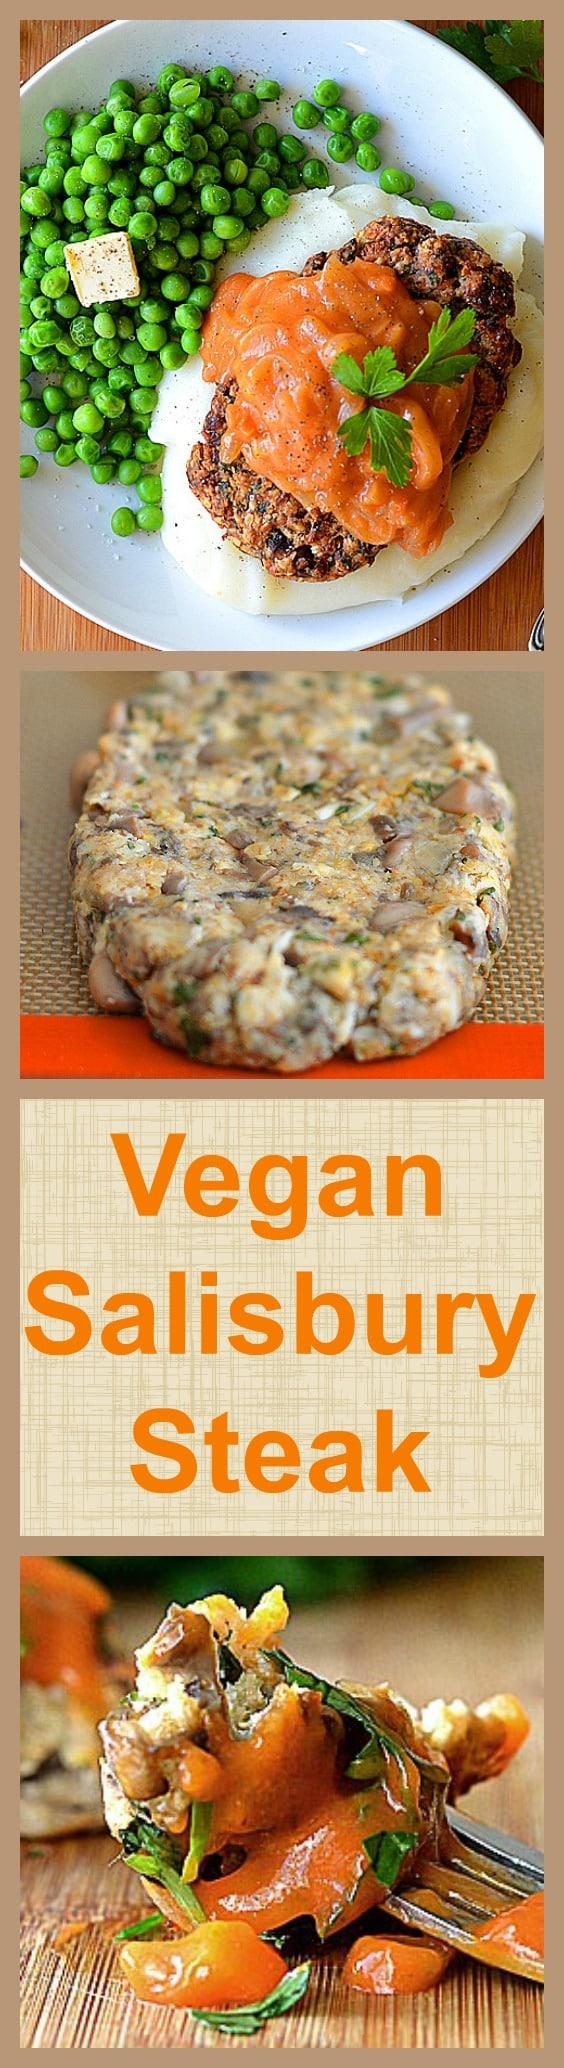 Vegan Salisbury Steak with Tomato Gravy